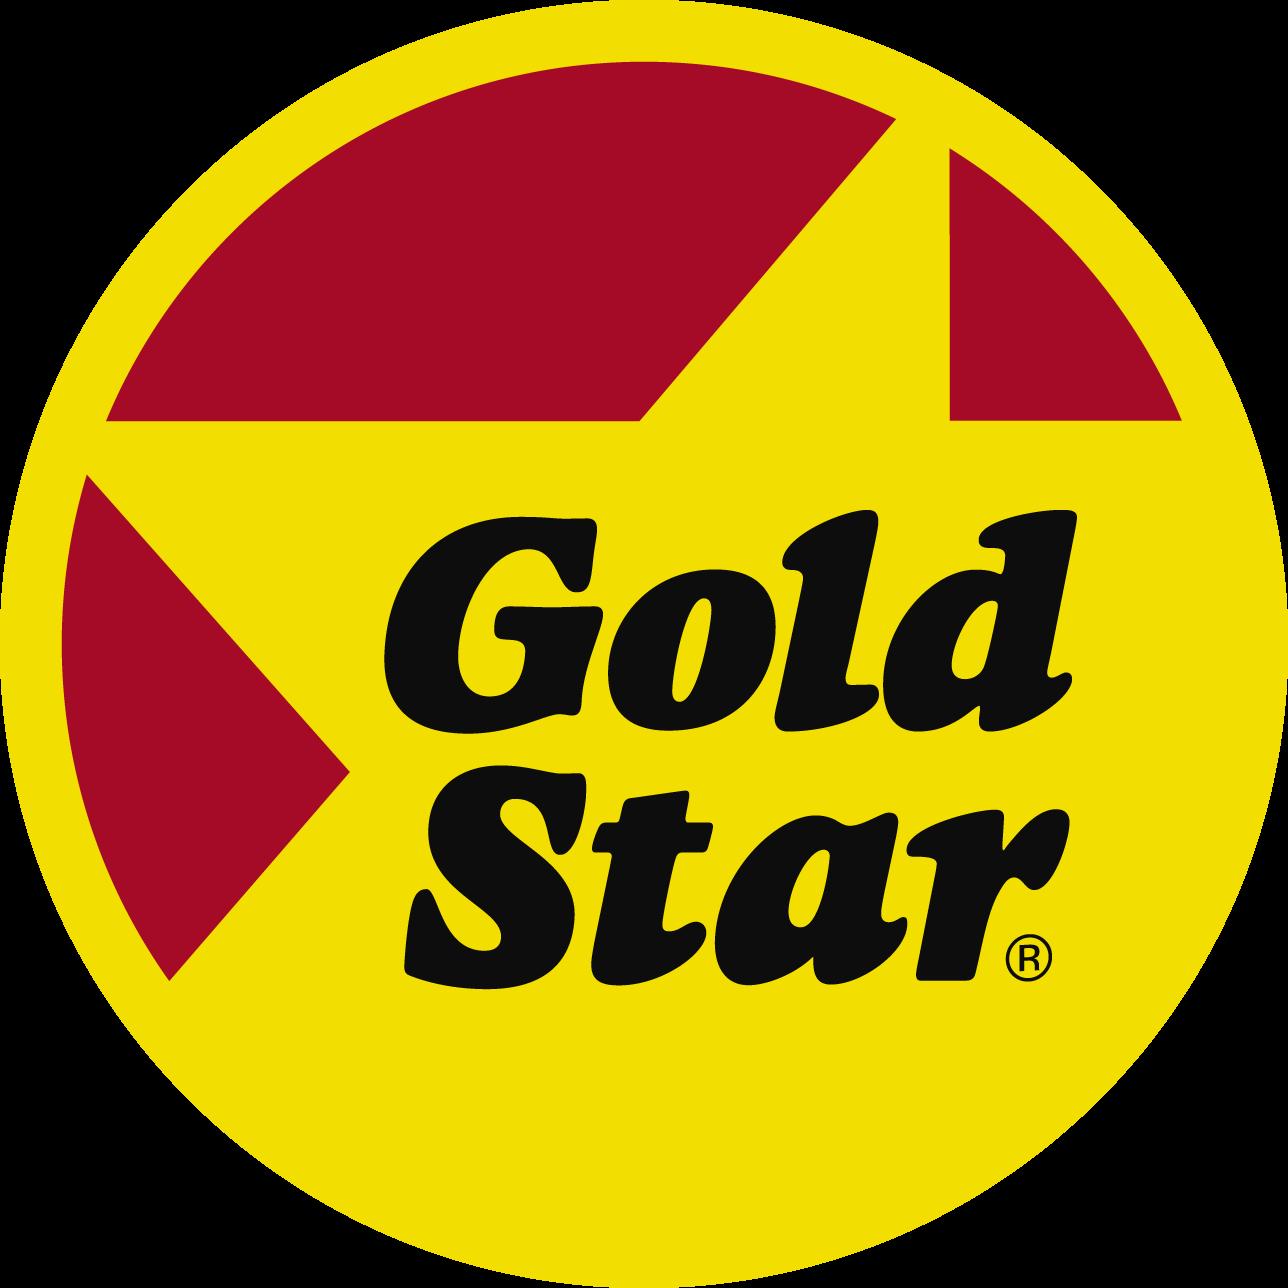 Gold Star Chili Wikipedia